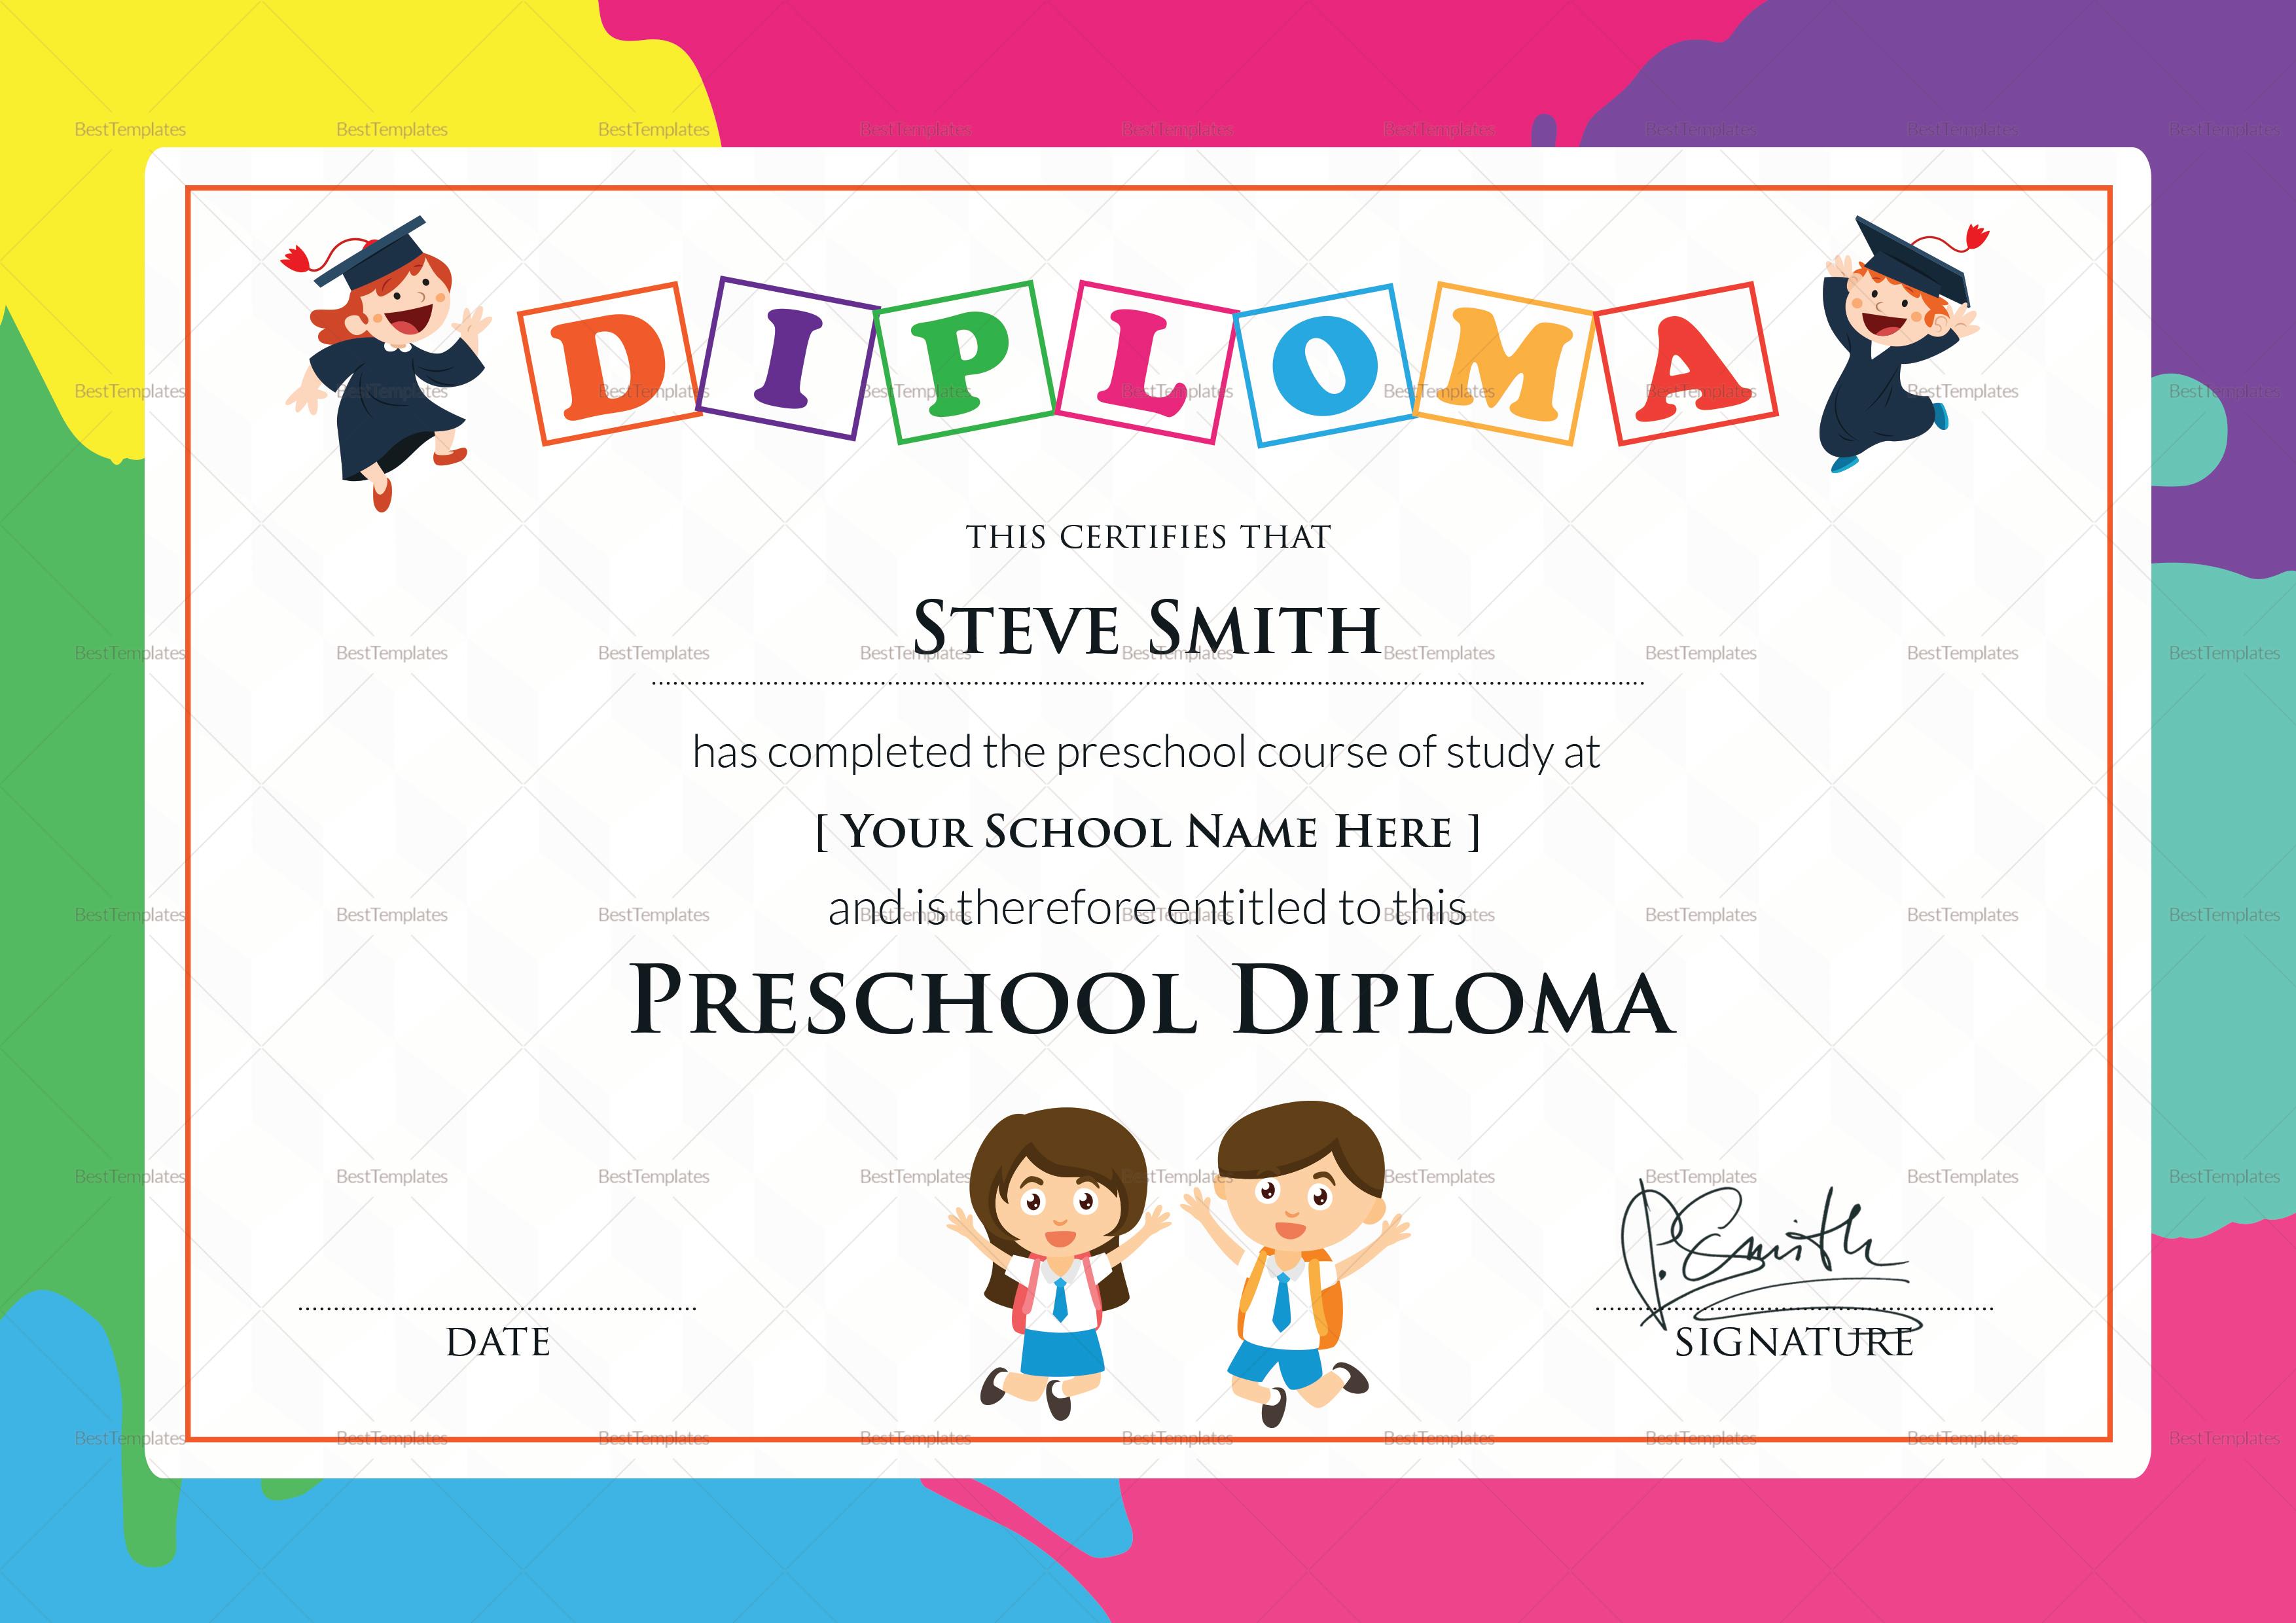 Preschool Diploma Certificate; Preschool Diploma Certificate Template